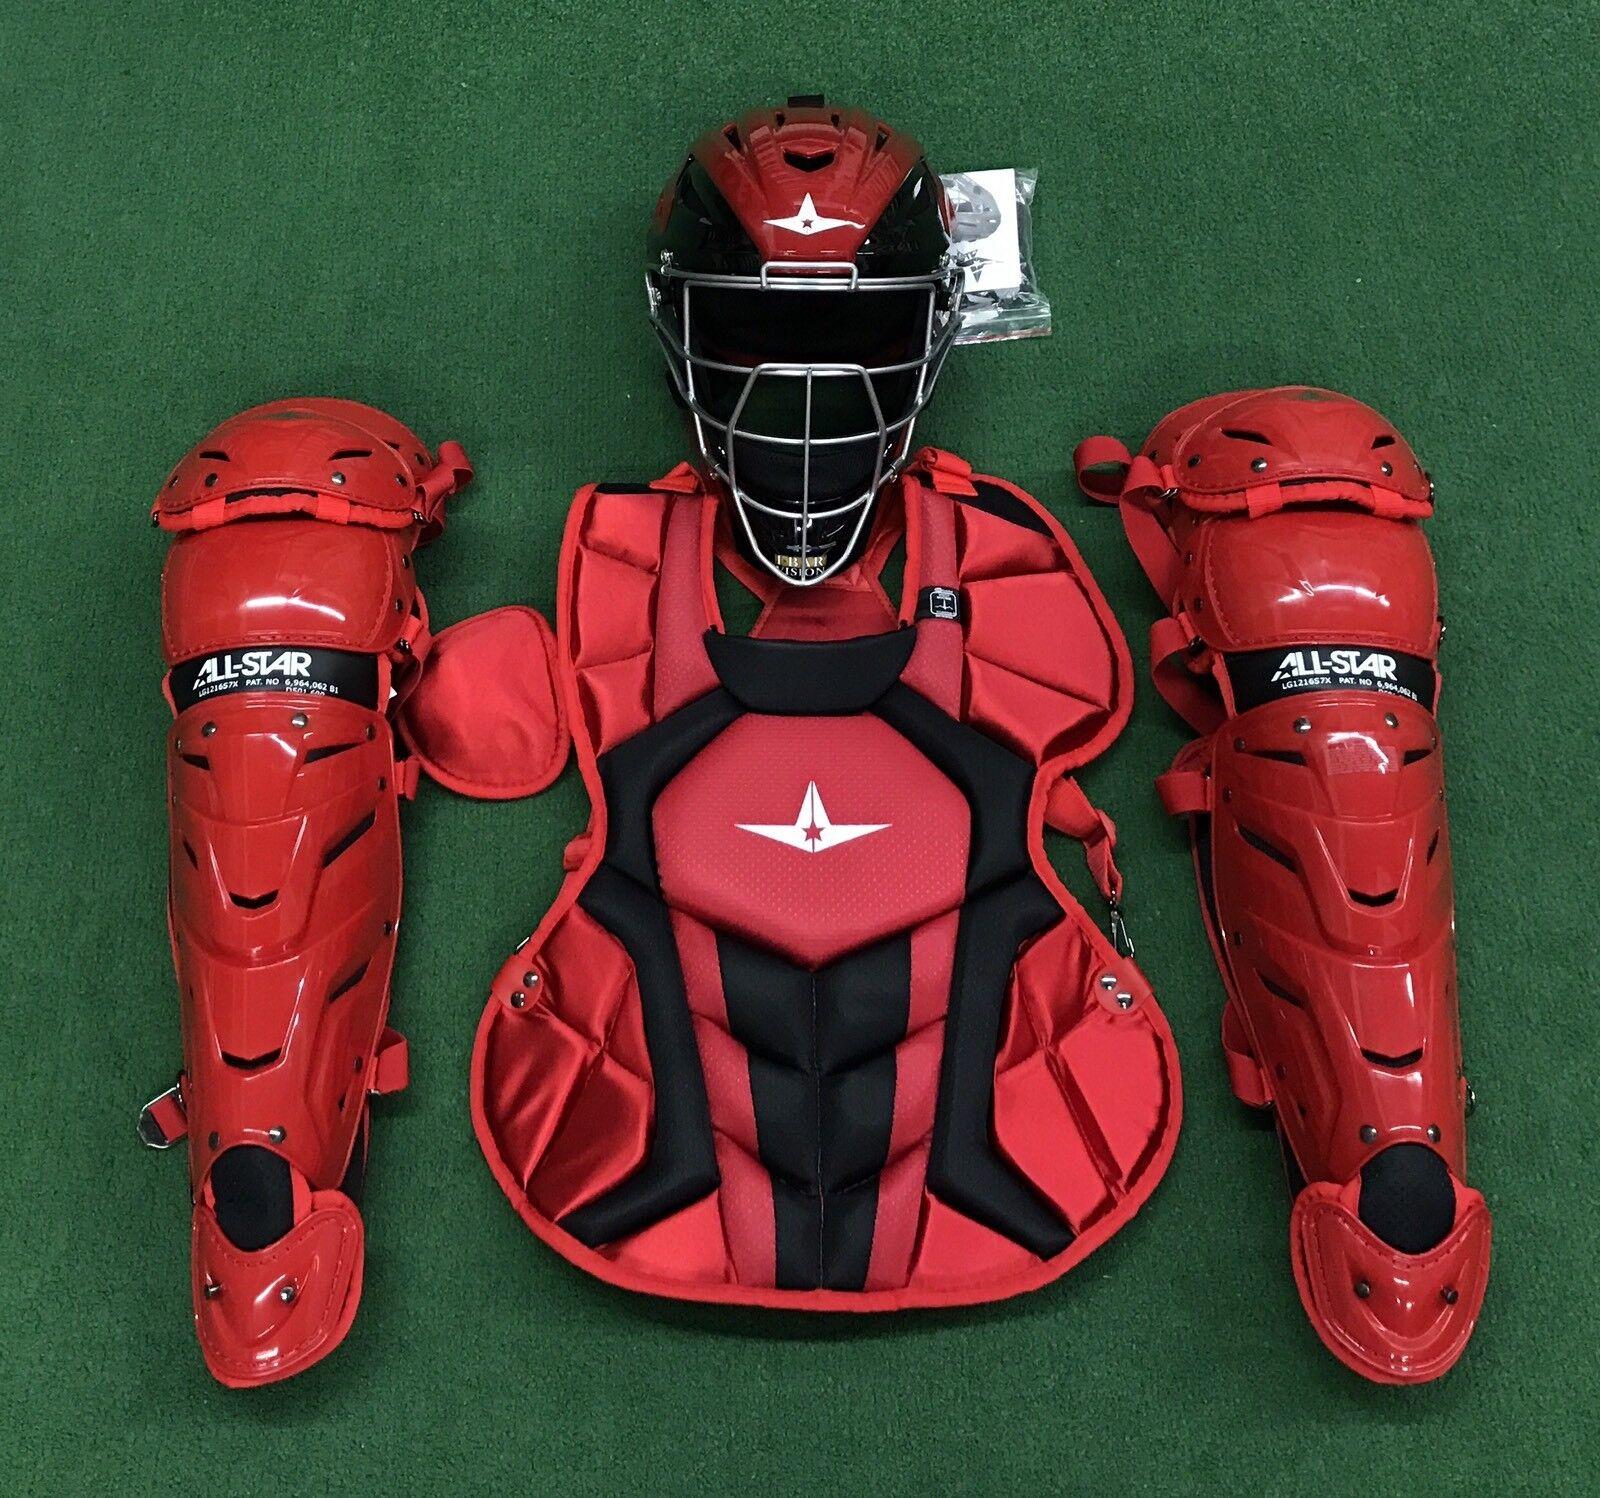 All Star System 7 Axis Intermediate 13-16 Catchers Gear Set - rojo negro